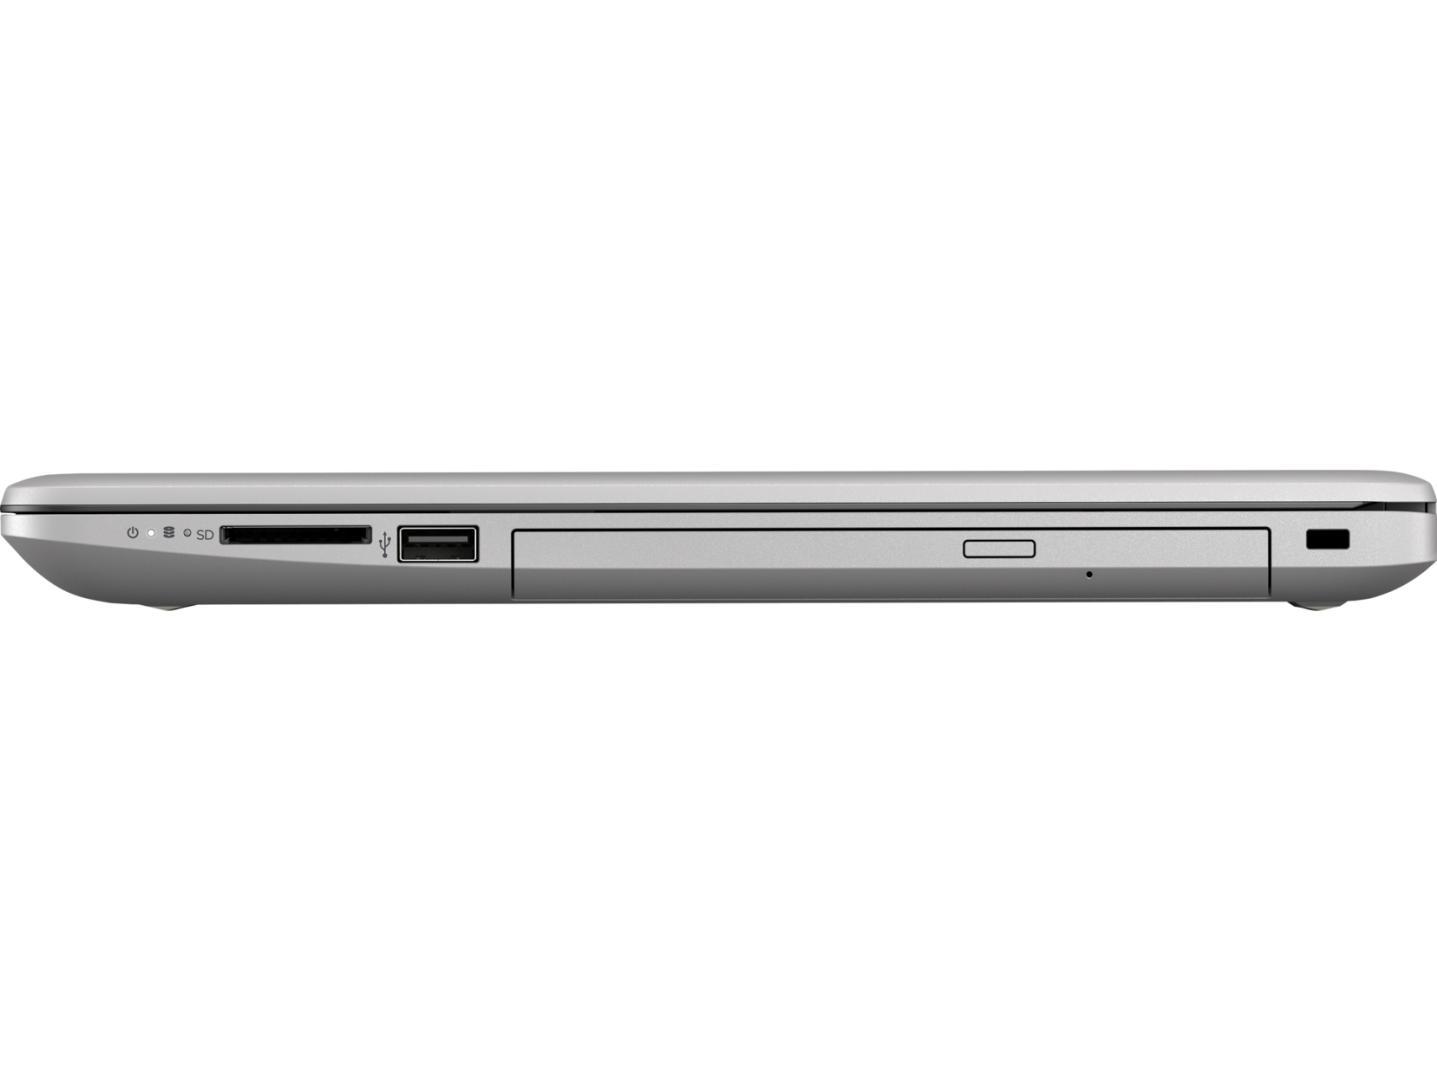 "NOTEBOOK HP 250G7 15.6"" FHD i3-1005G1 8GB 256GB 2GB-MX110 DOS - imaginea 7"